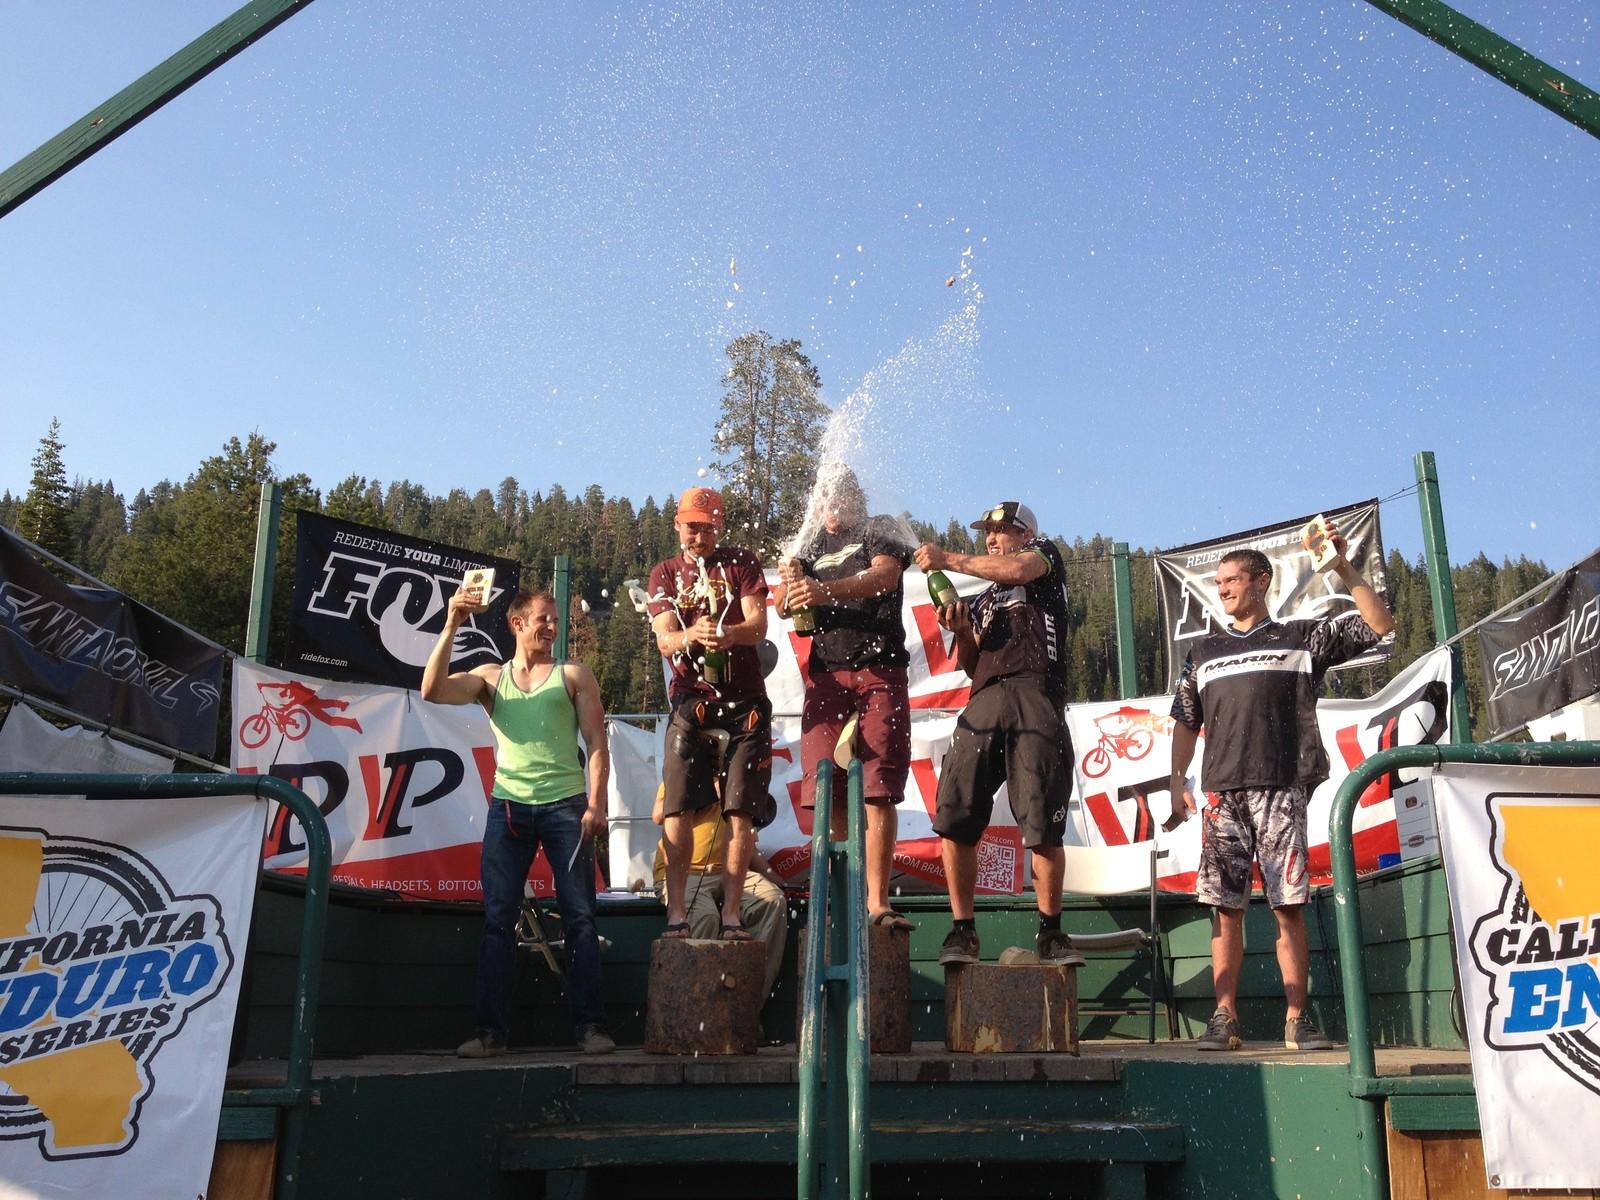 China Peak Enduro Pro Men's Podium - Race Report, Video & Photos from the China Peak Enduro presented by Santa Cruz and VP Components - Mountain Biking Pictures - Vital MTB